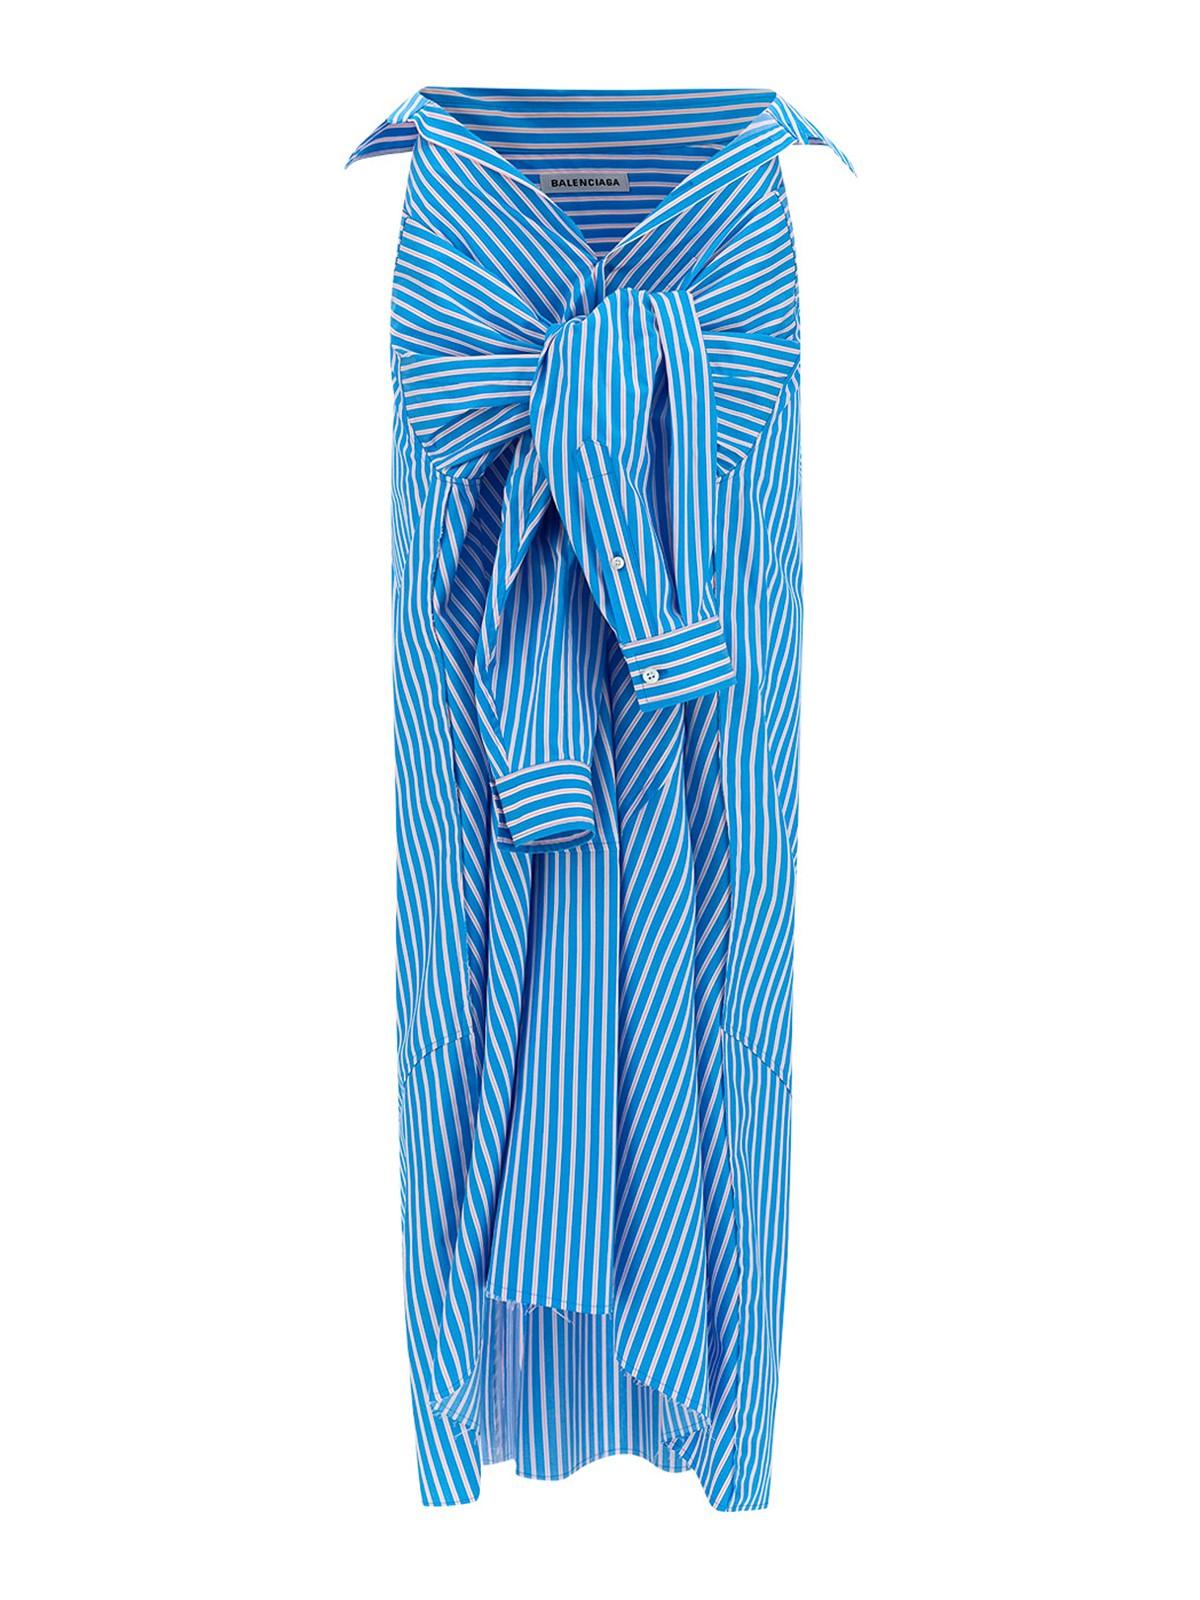 Balenciaga STRIPED SHIRT-STYLE SKIRT